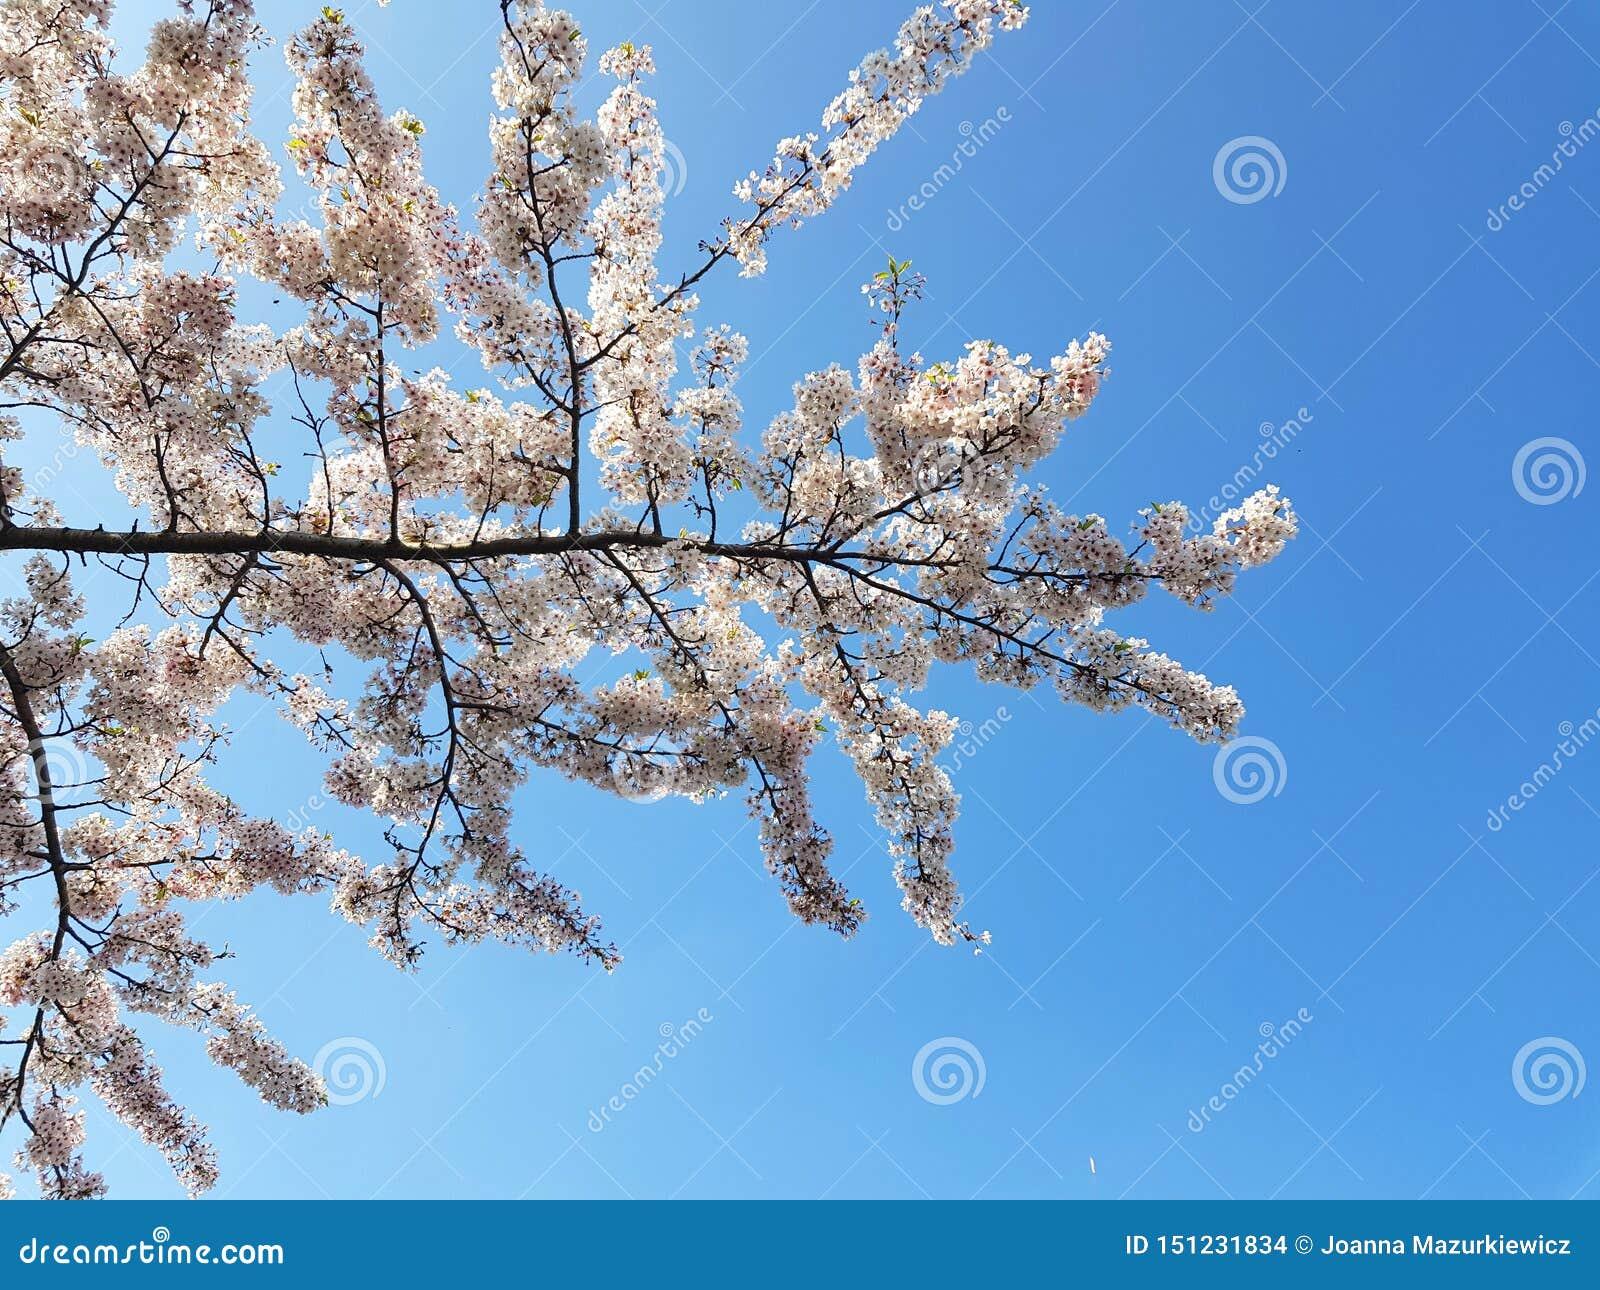 Vita blommor på en trädfilial mot blå himmel